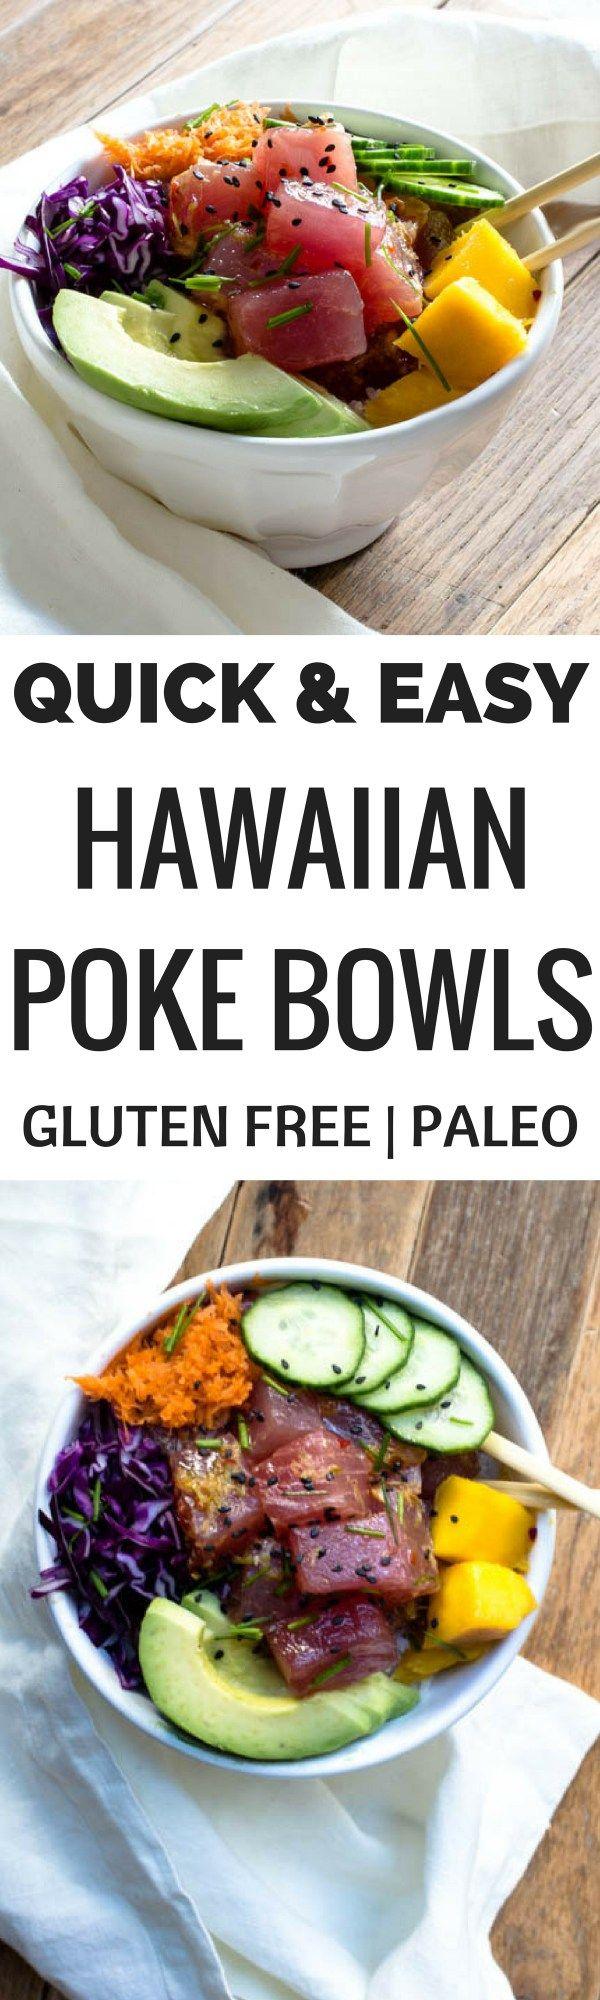 Quick and easy Hawaiian poke bowls recipe. Paleo poke bowls. Healthy, homemade, gluten free poke bowl recipe. Tuna poke bowls. How to make the perfect poke bowl at home!